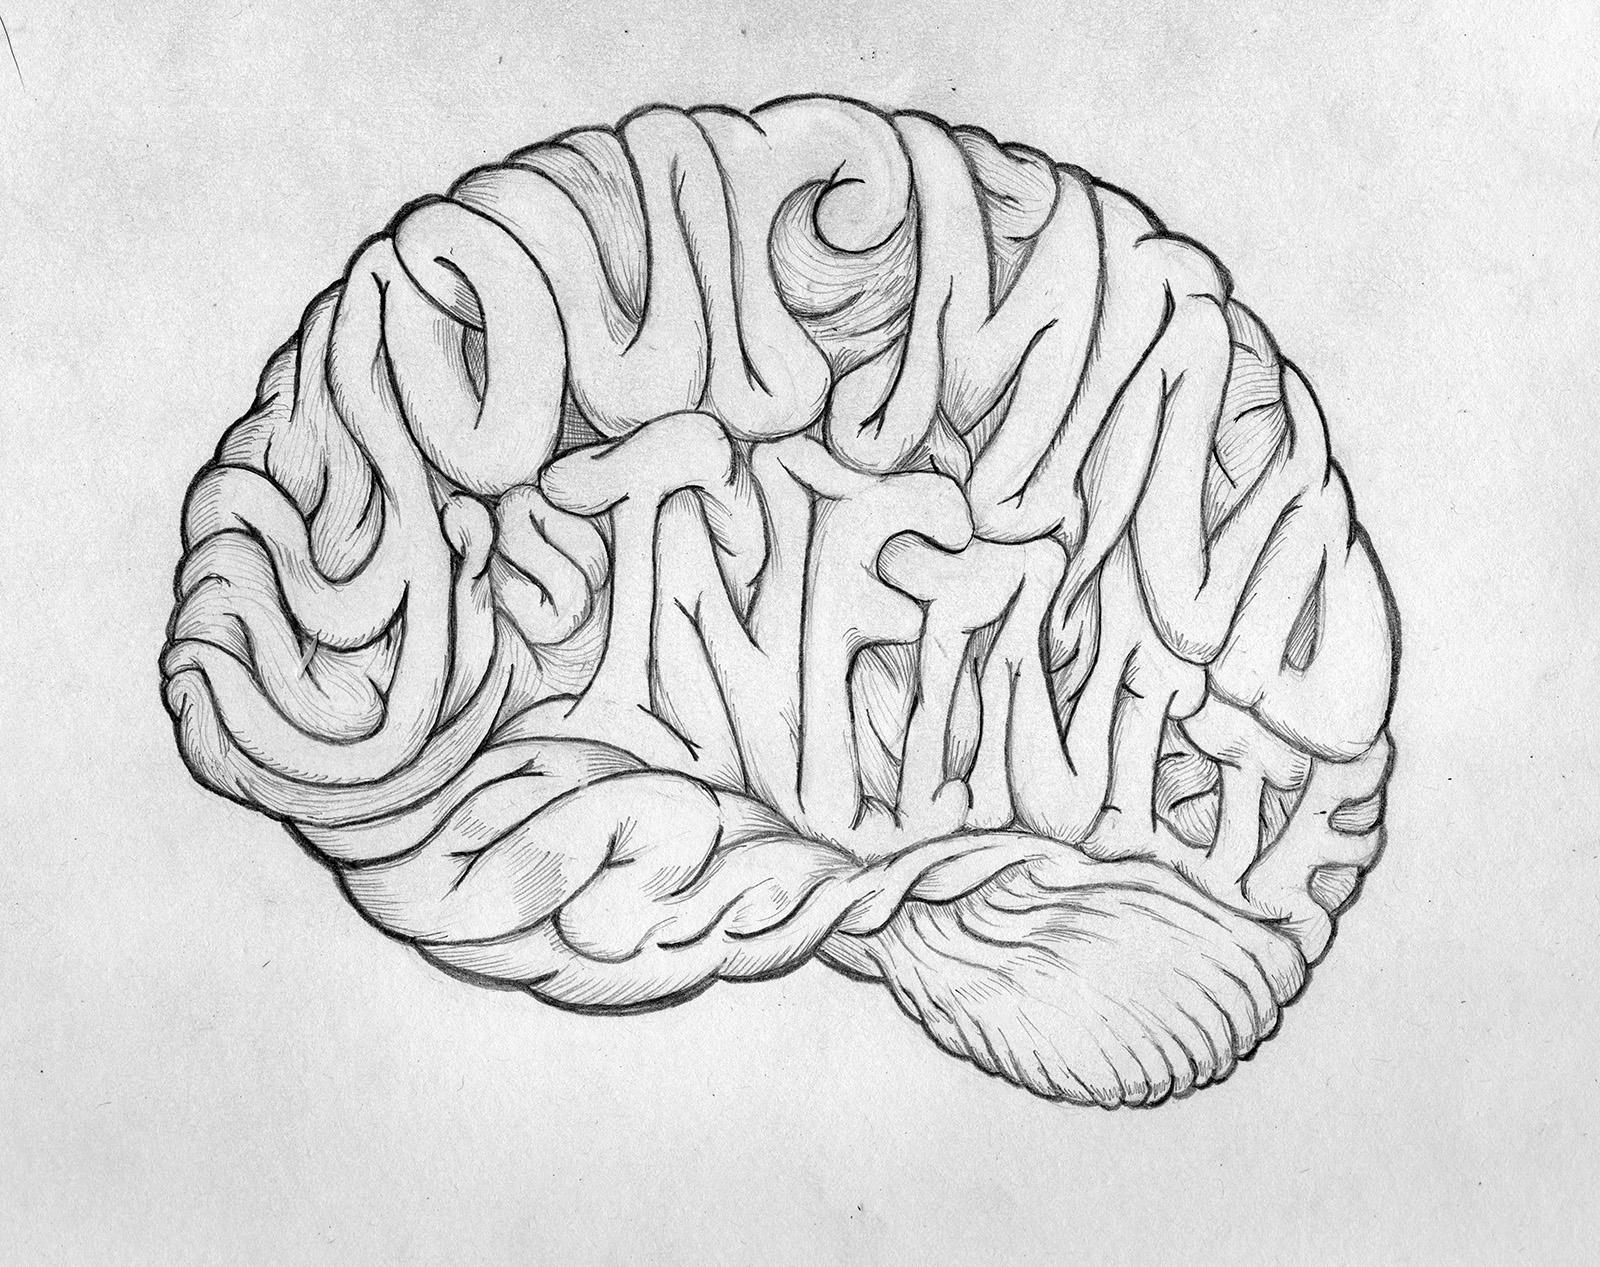 brain sketch003-web.jpg